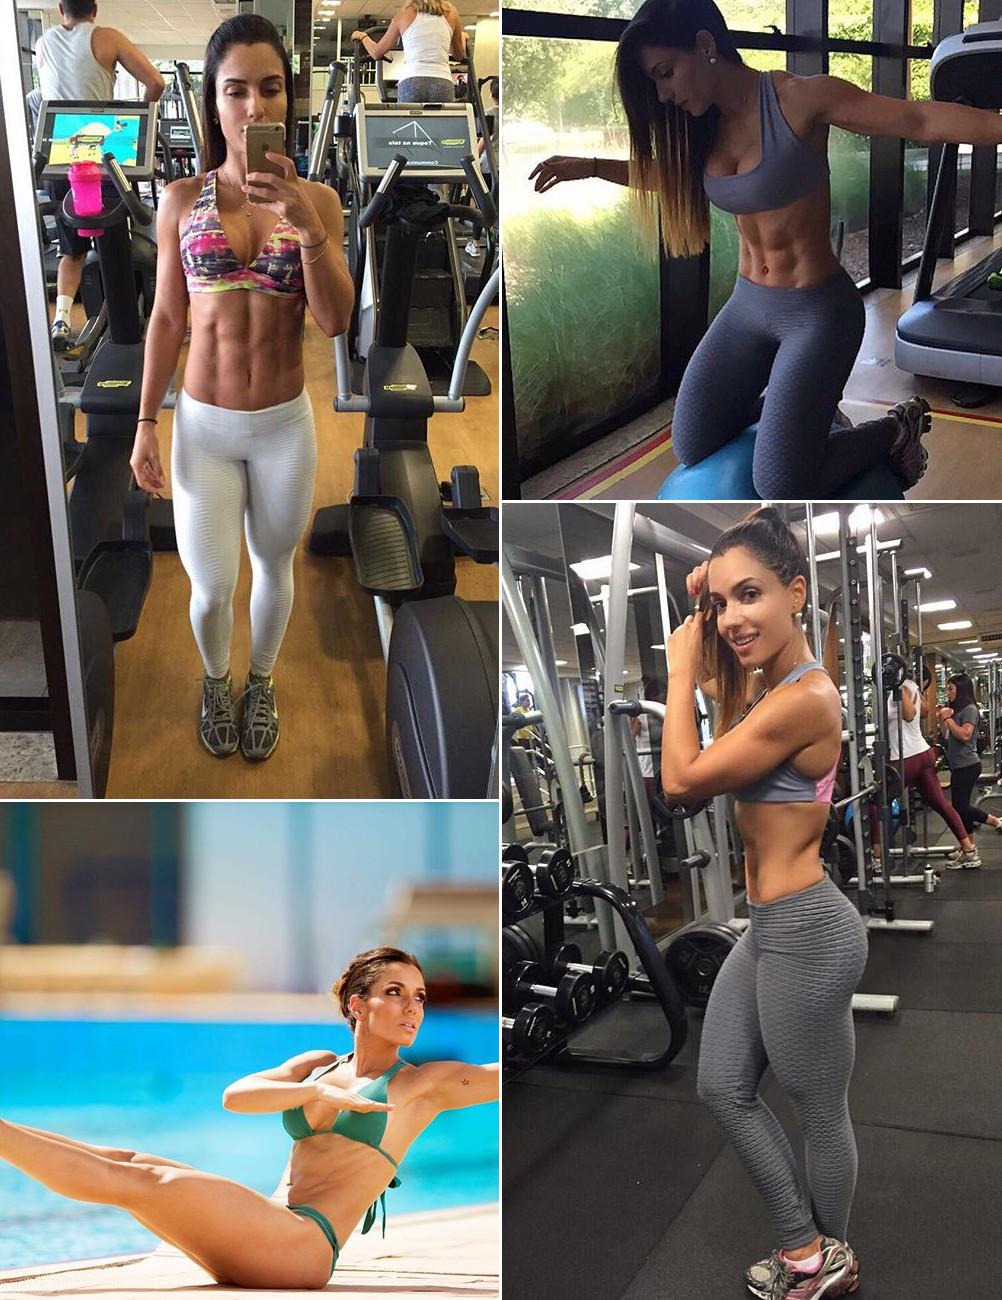 FitNish.com Interview With A Fit Brazilian Beauty, Mariana Medeiros Nóbrega